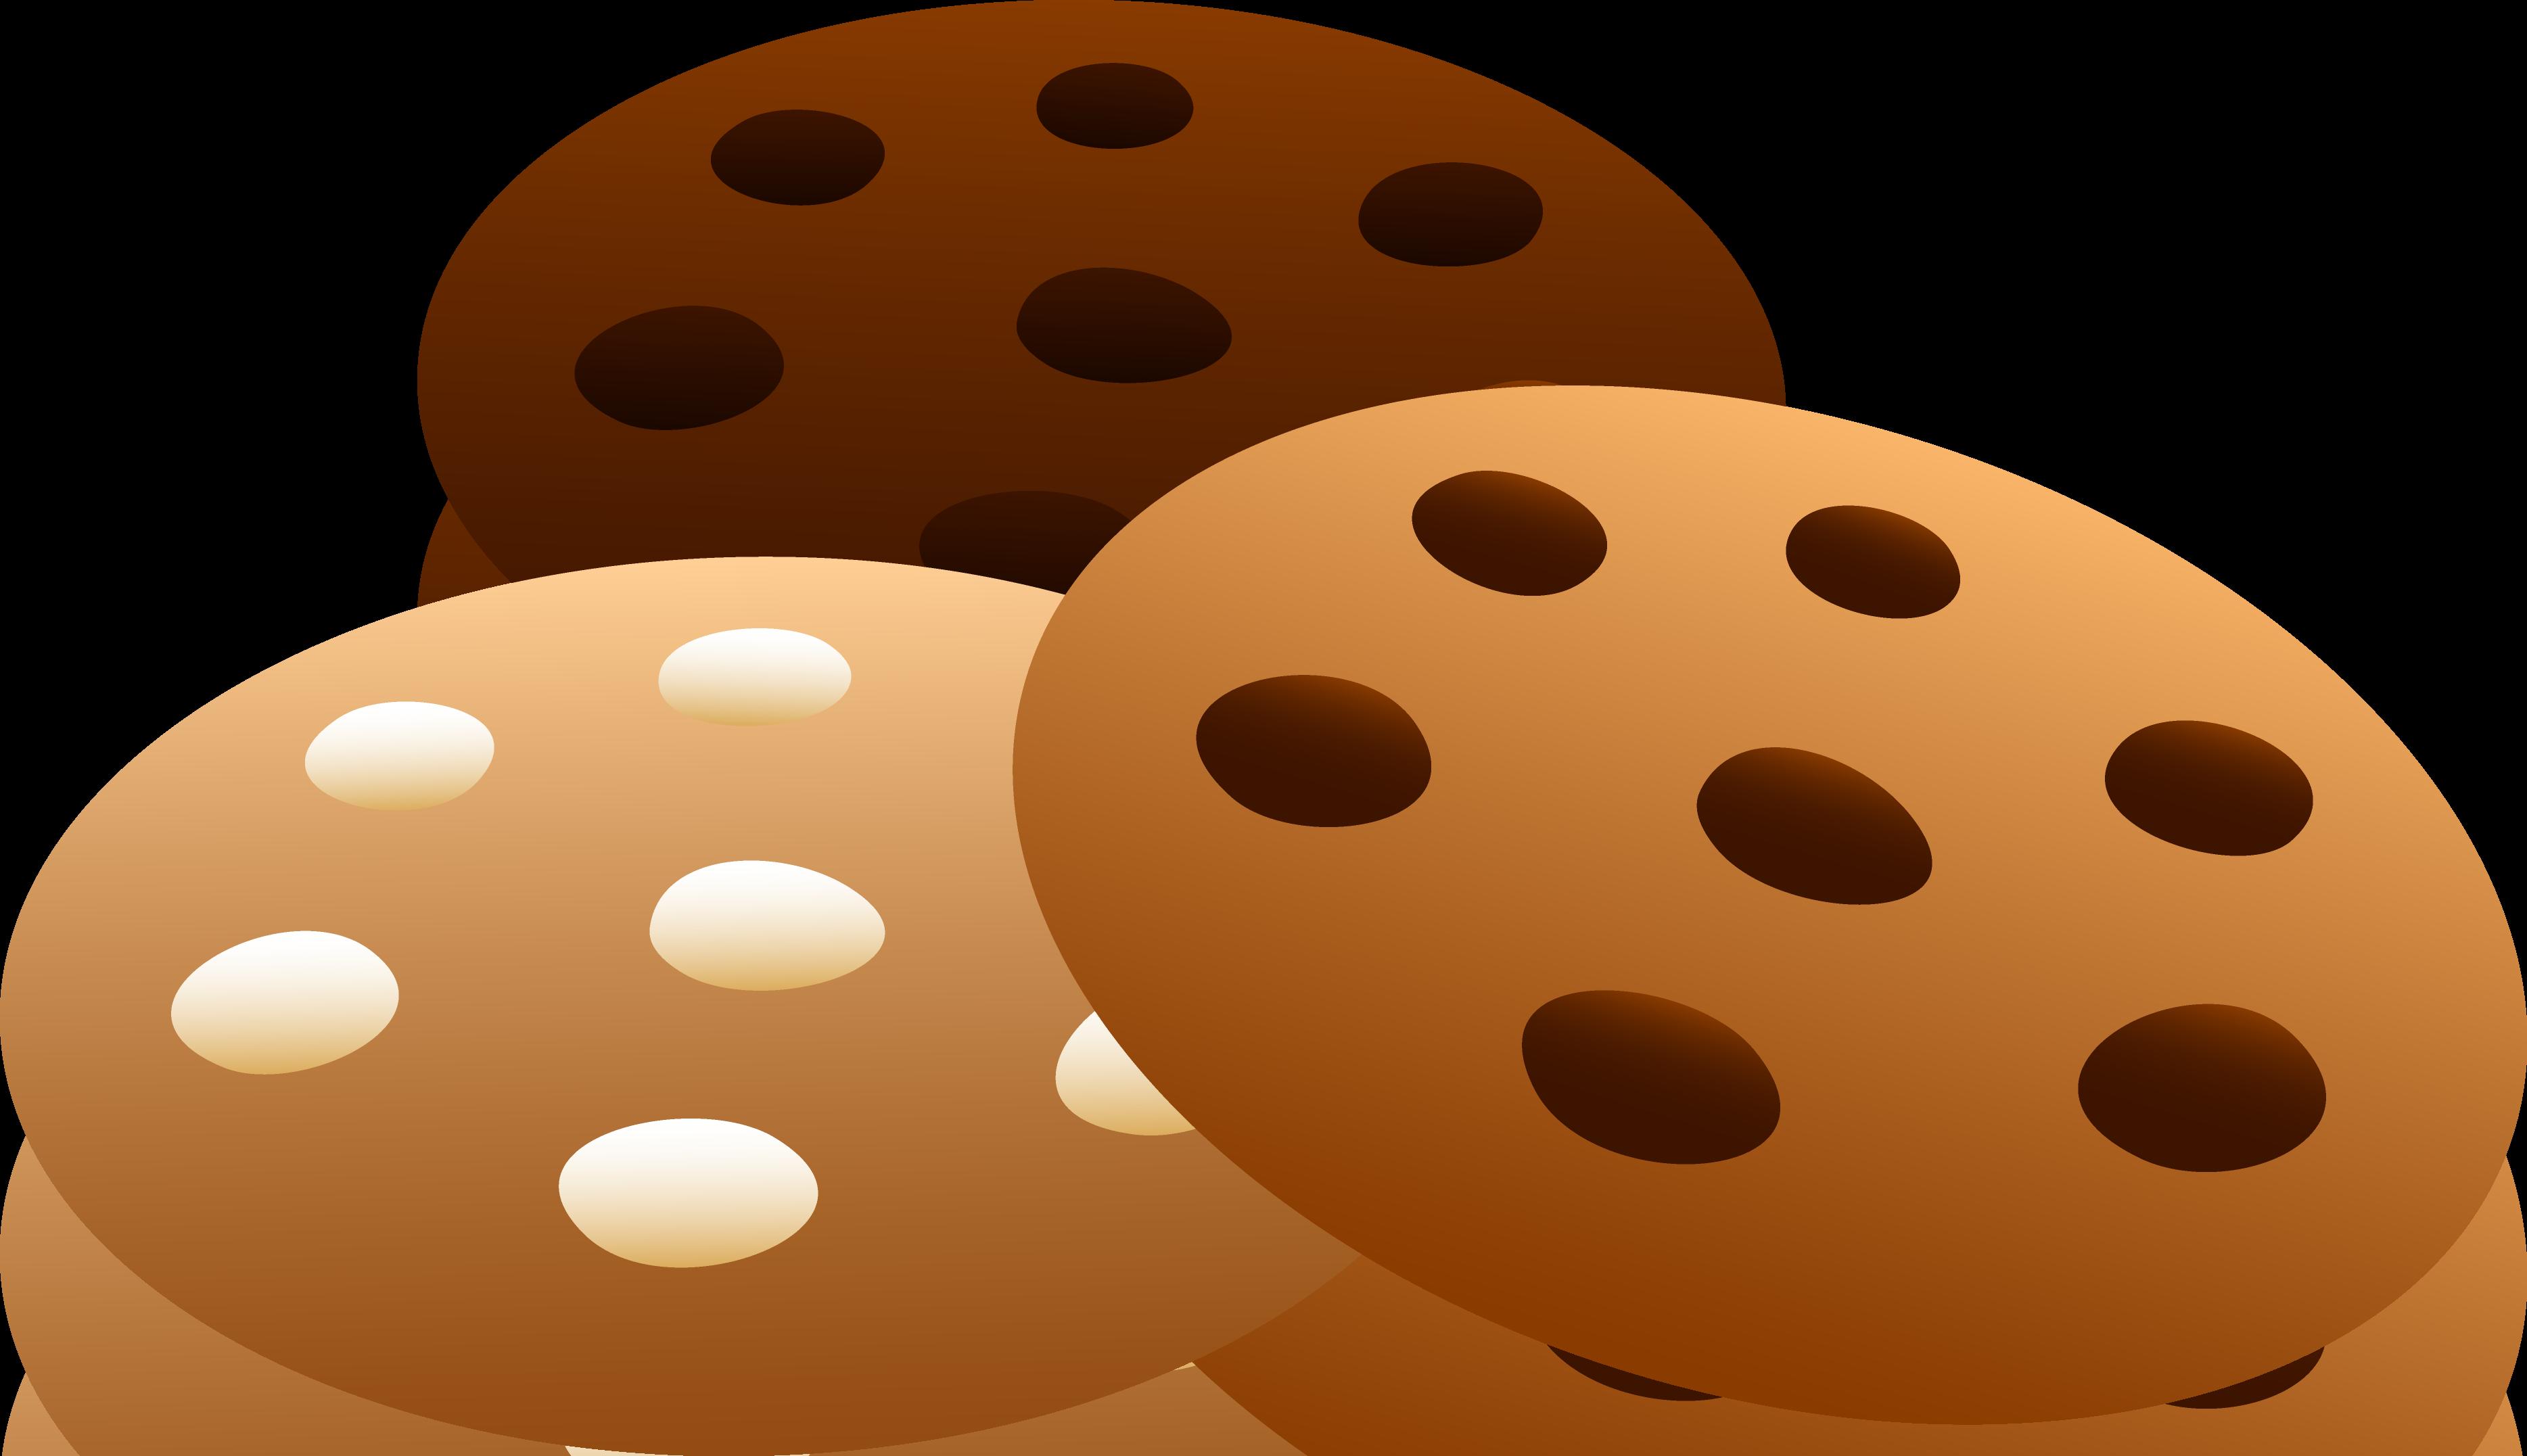 Clip Art Cookies Clipart cookies clipart-Clip Art Cookies Clipart cookies clipart clipartall of free clip art-8